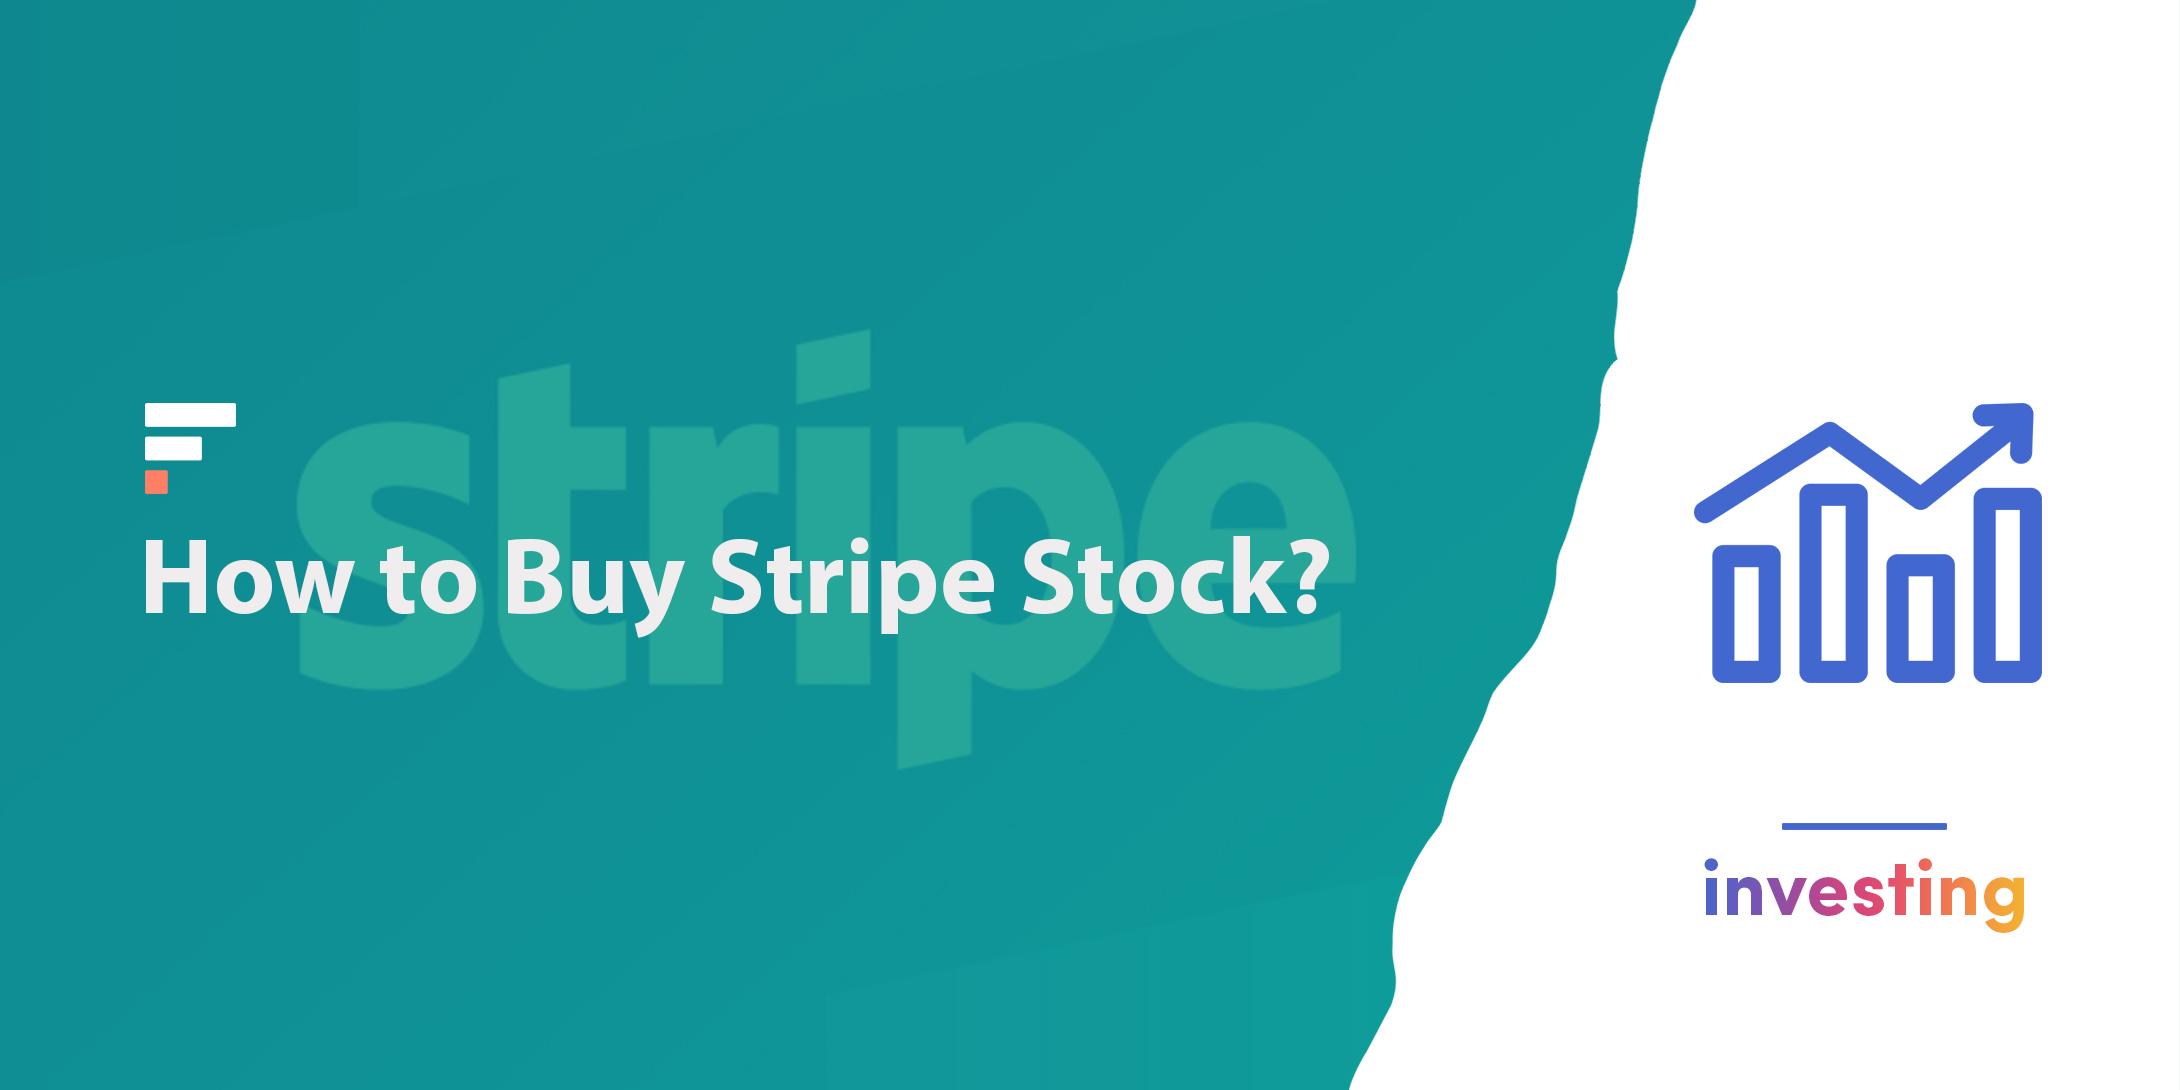 How to buy Stripe stock?